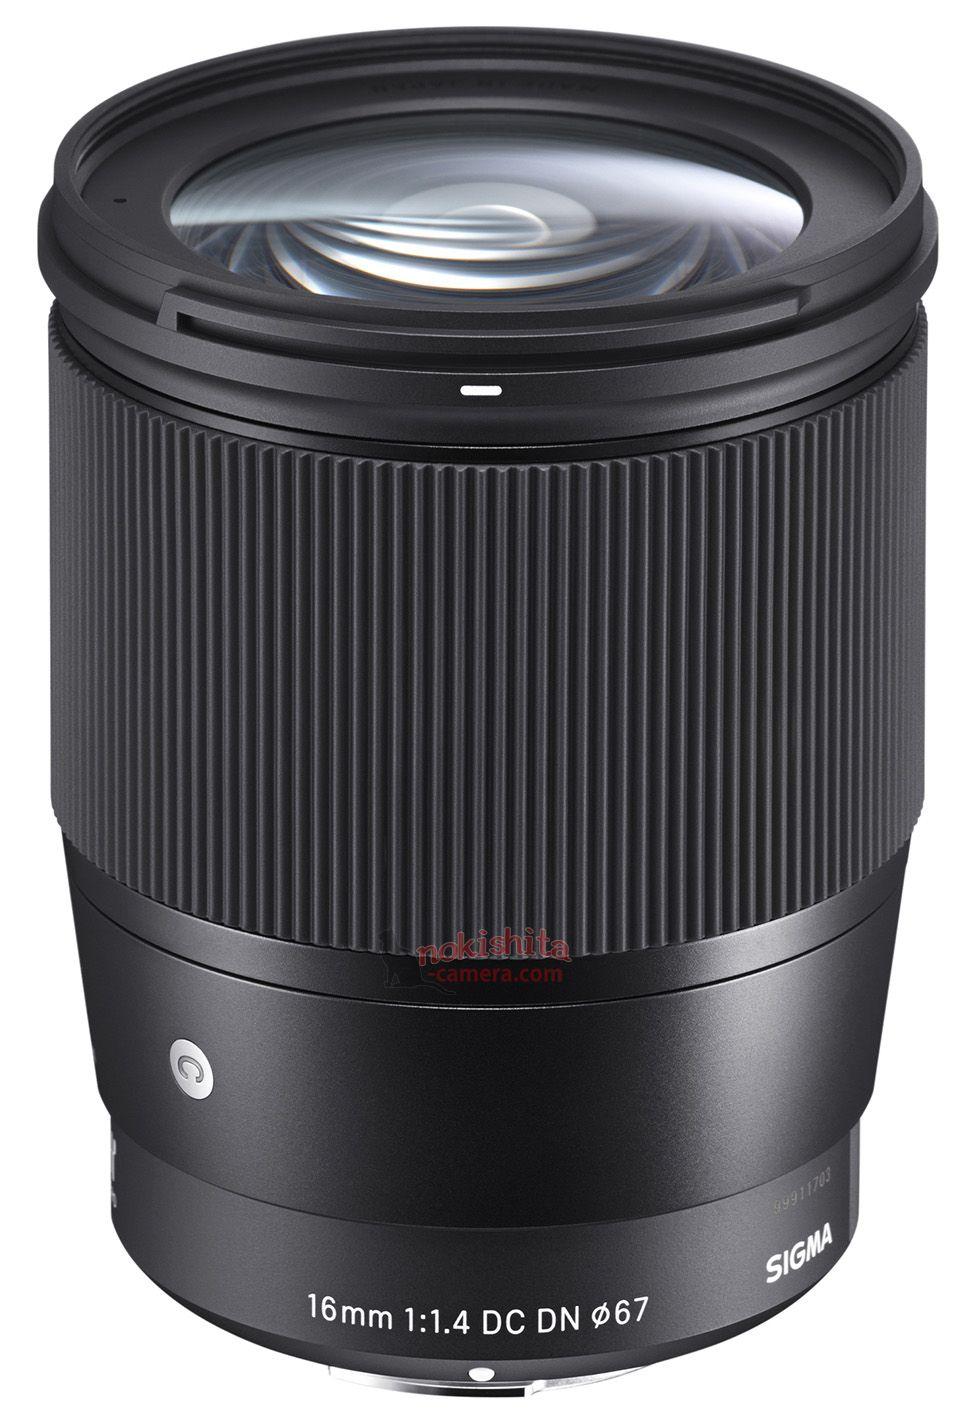 Sigma 16mm f/1.4 DC DN